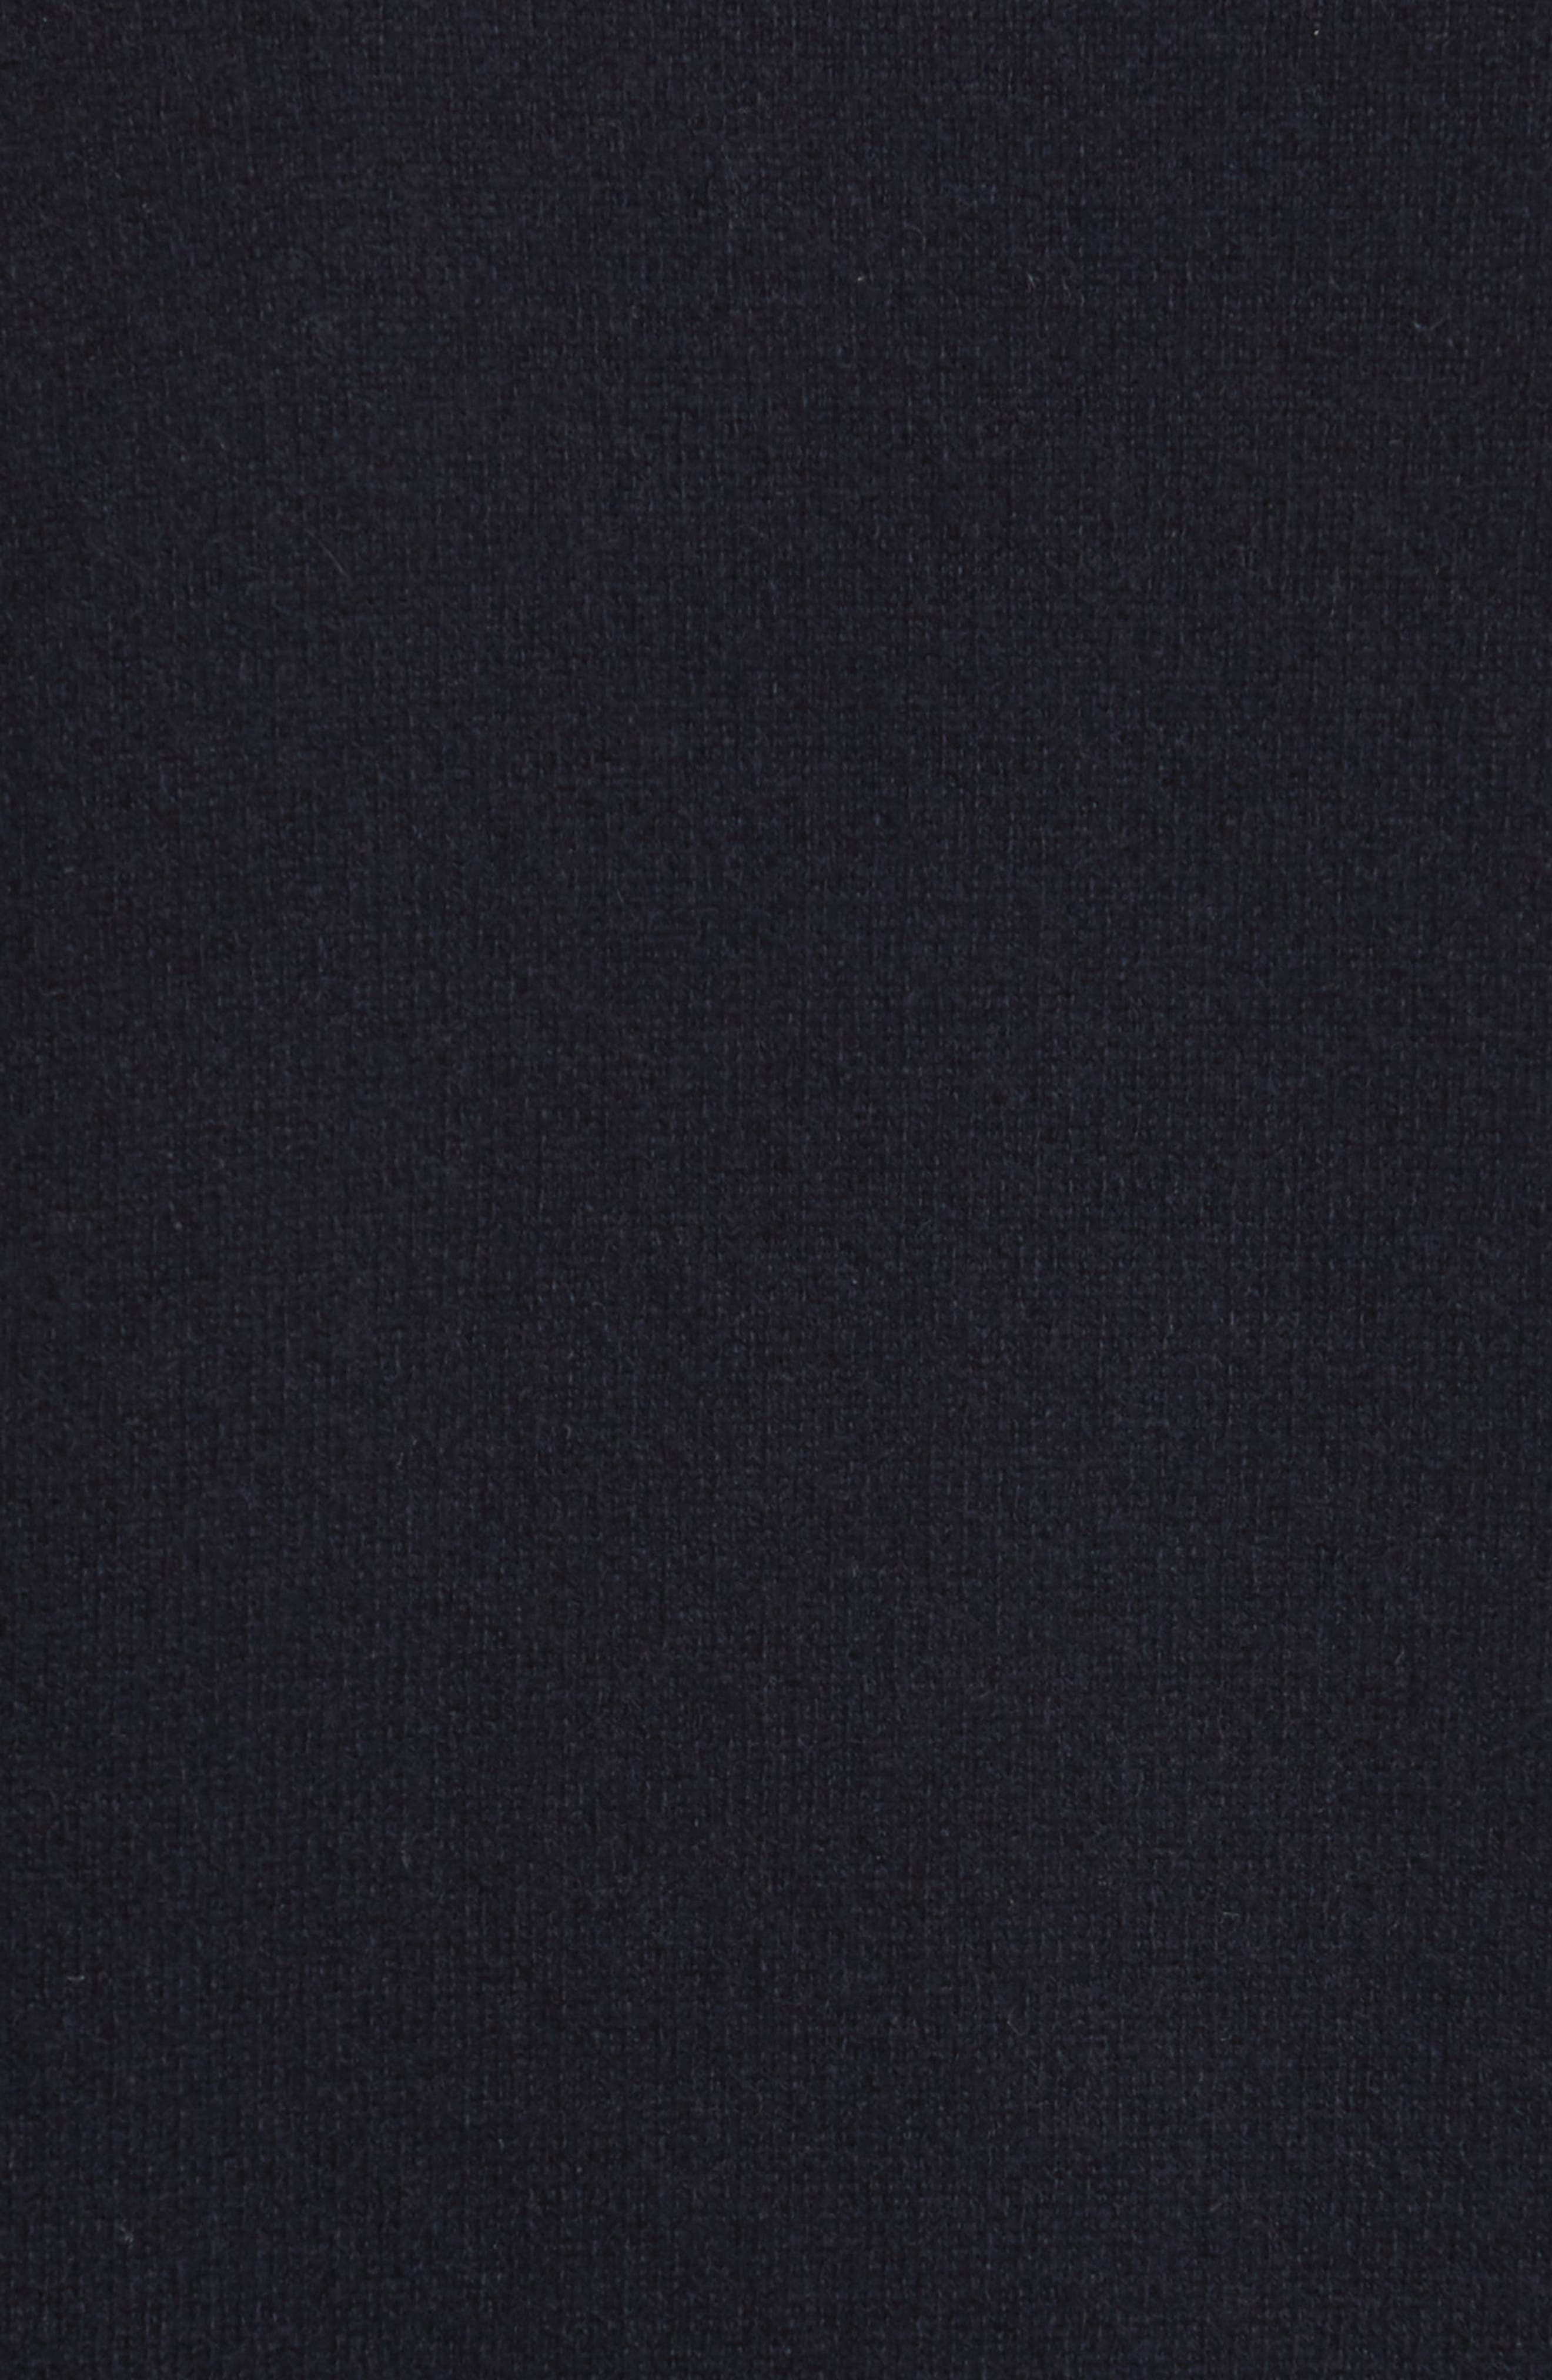 Double Layer Cashmere & Cotton Sweater,                             Alternate thumbnail 5, color,                             Coastal/ Black